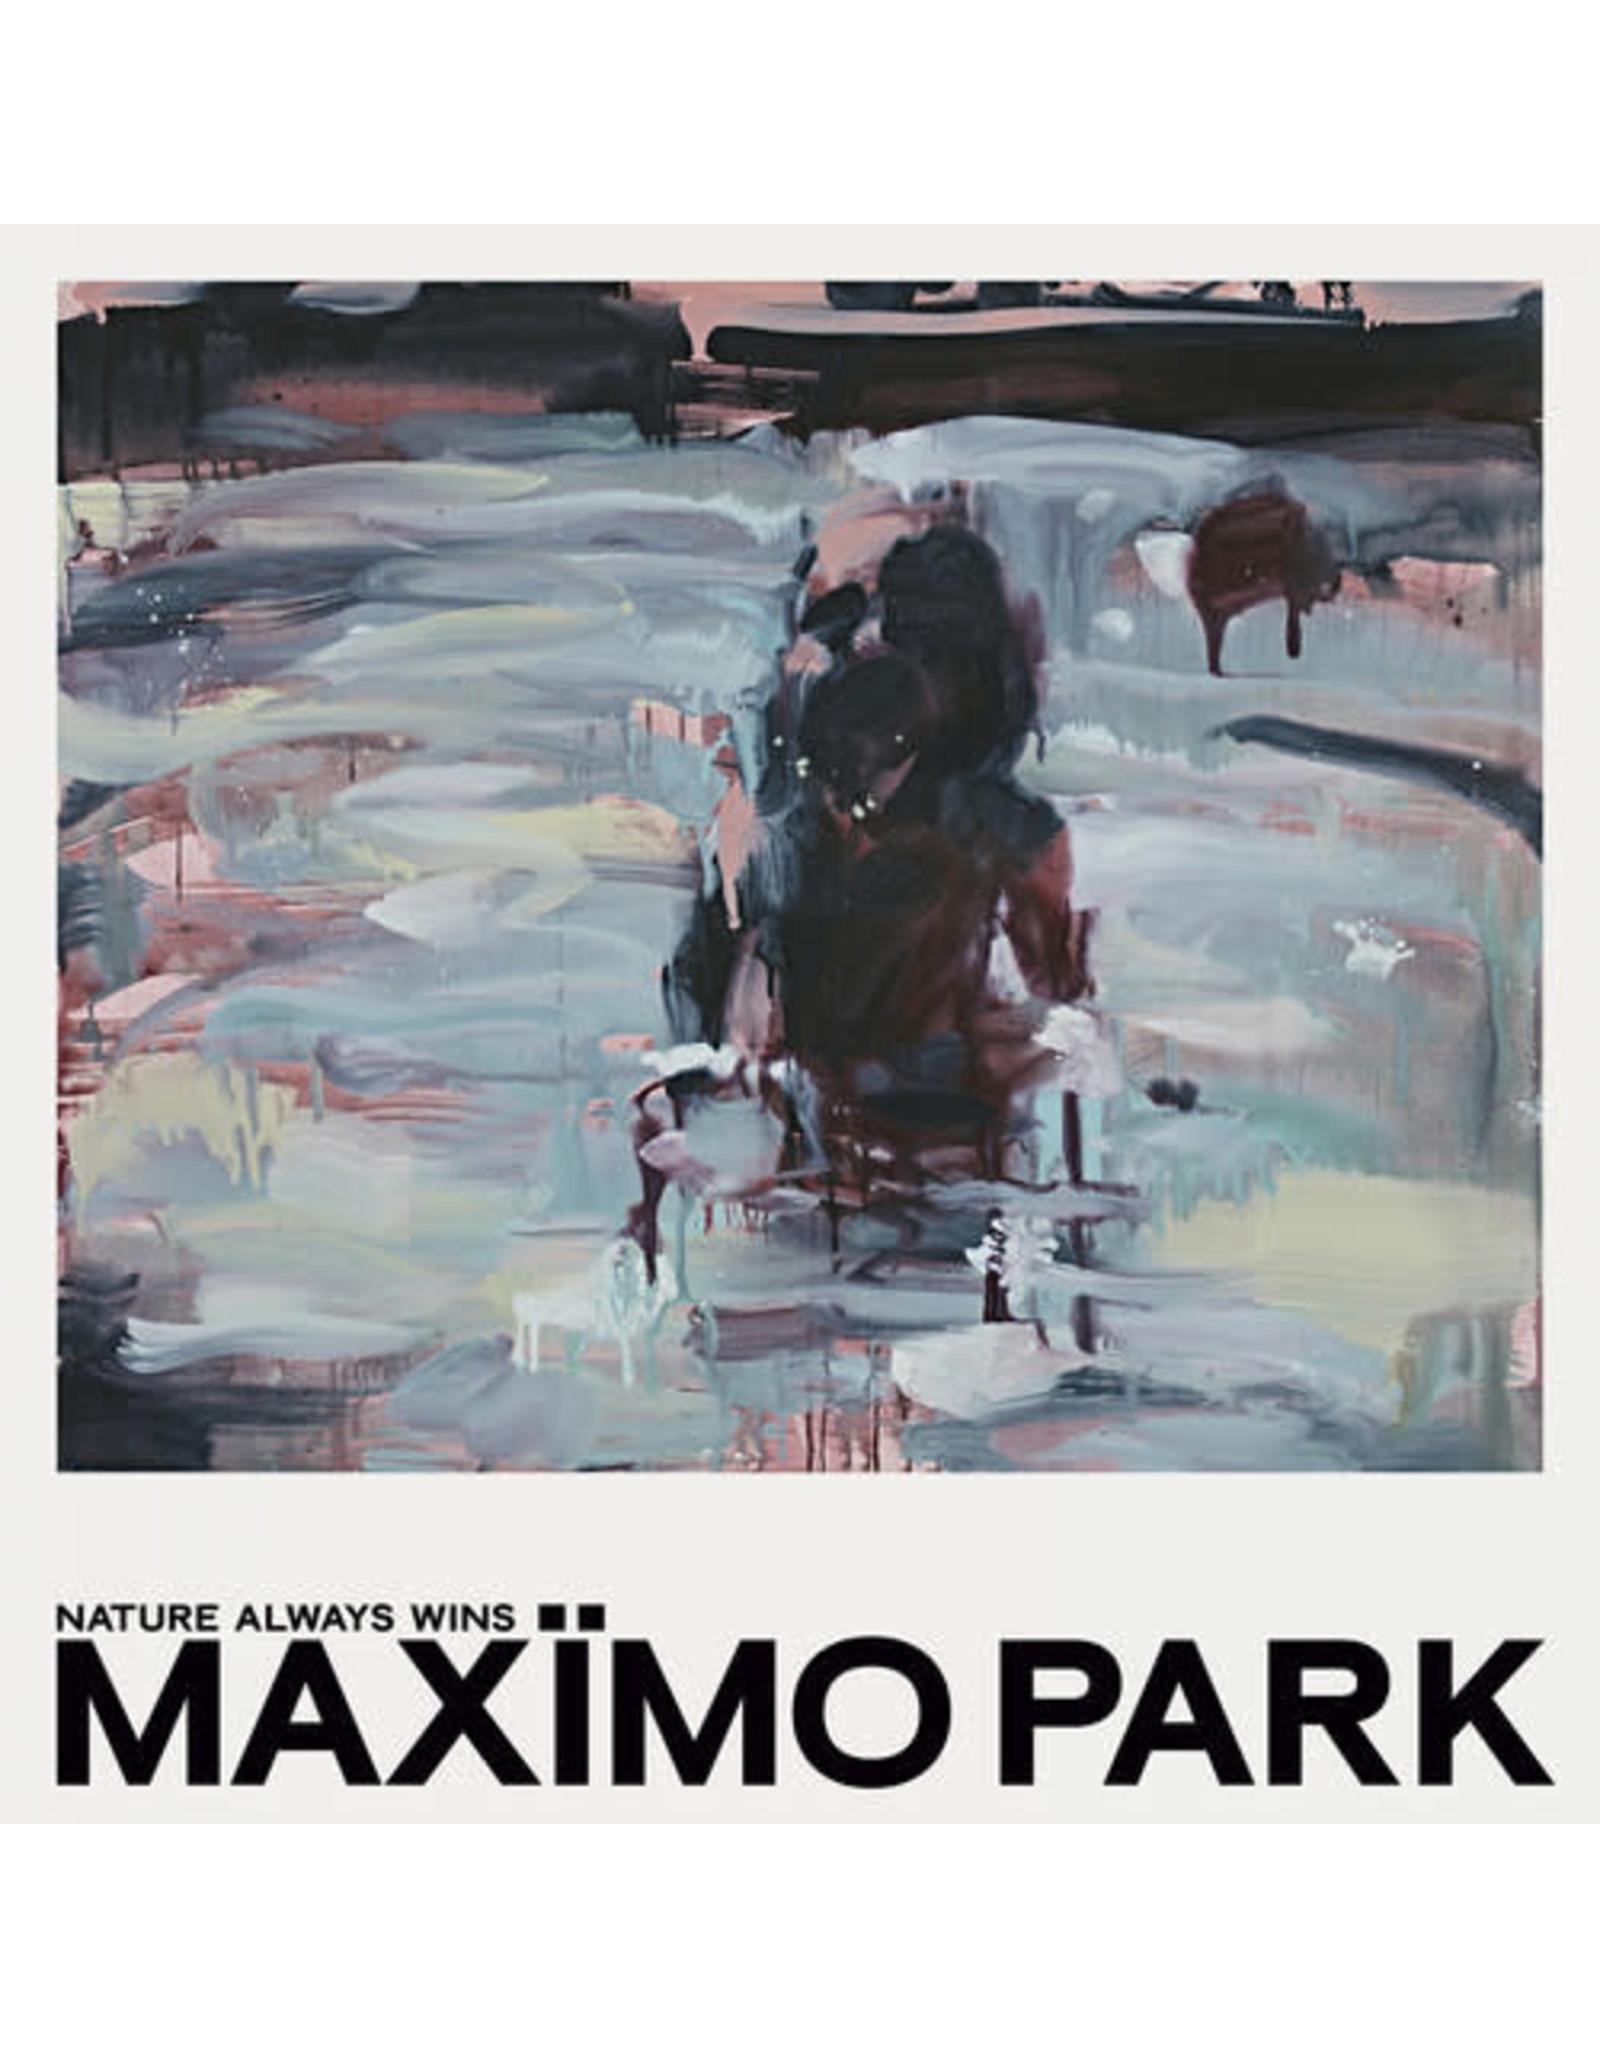 New Vinyl Maximo Park - Nature Always Wins LP